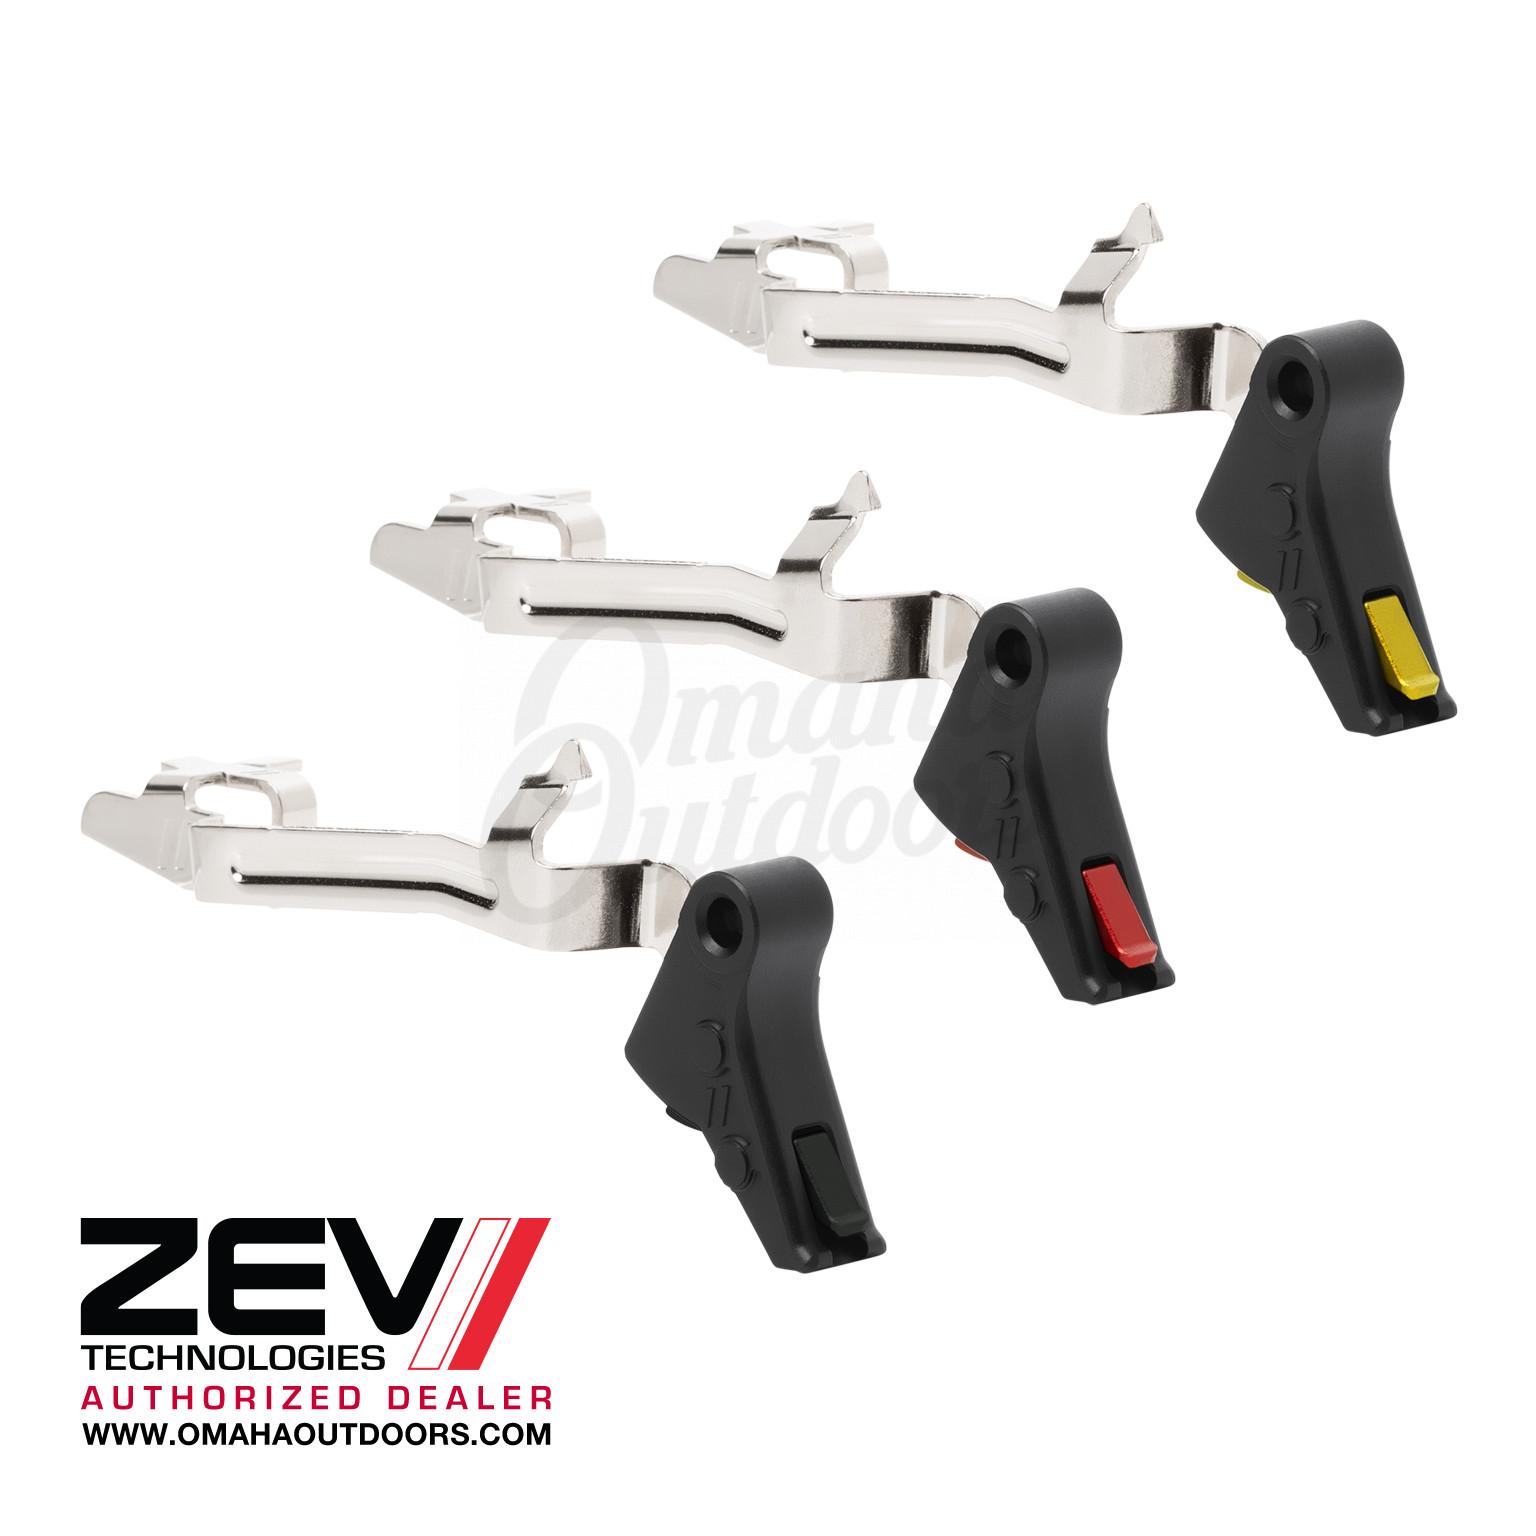 26 Photos 31 Reviews: ZEV Tech PRO Flat Face Trigger Bar Kit Glock Gen 3 17 19